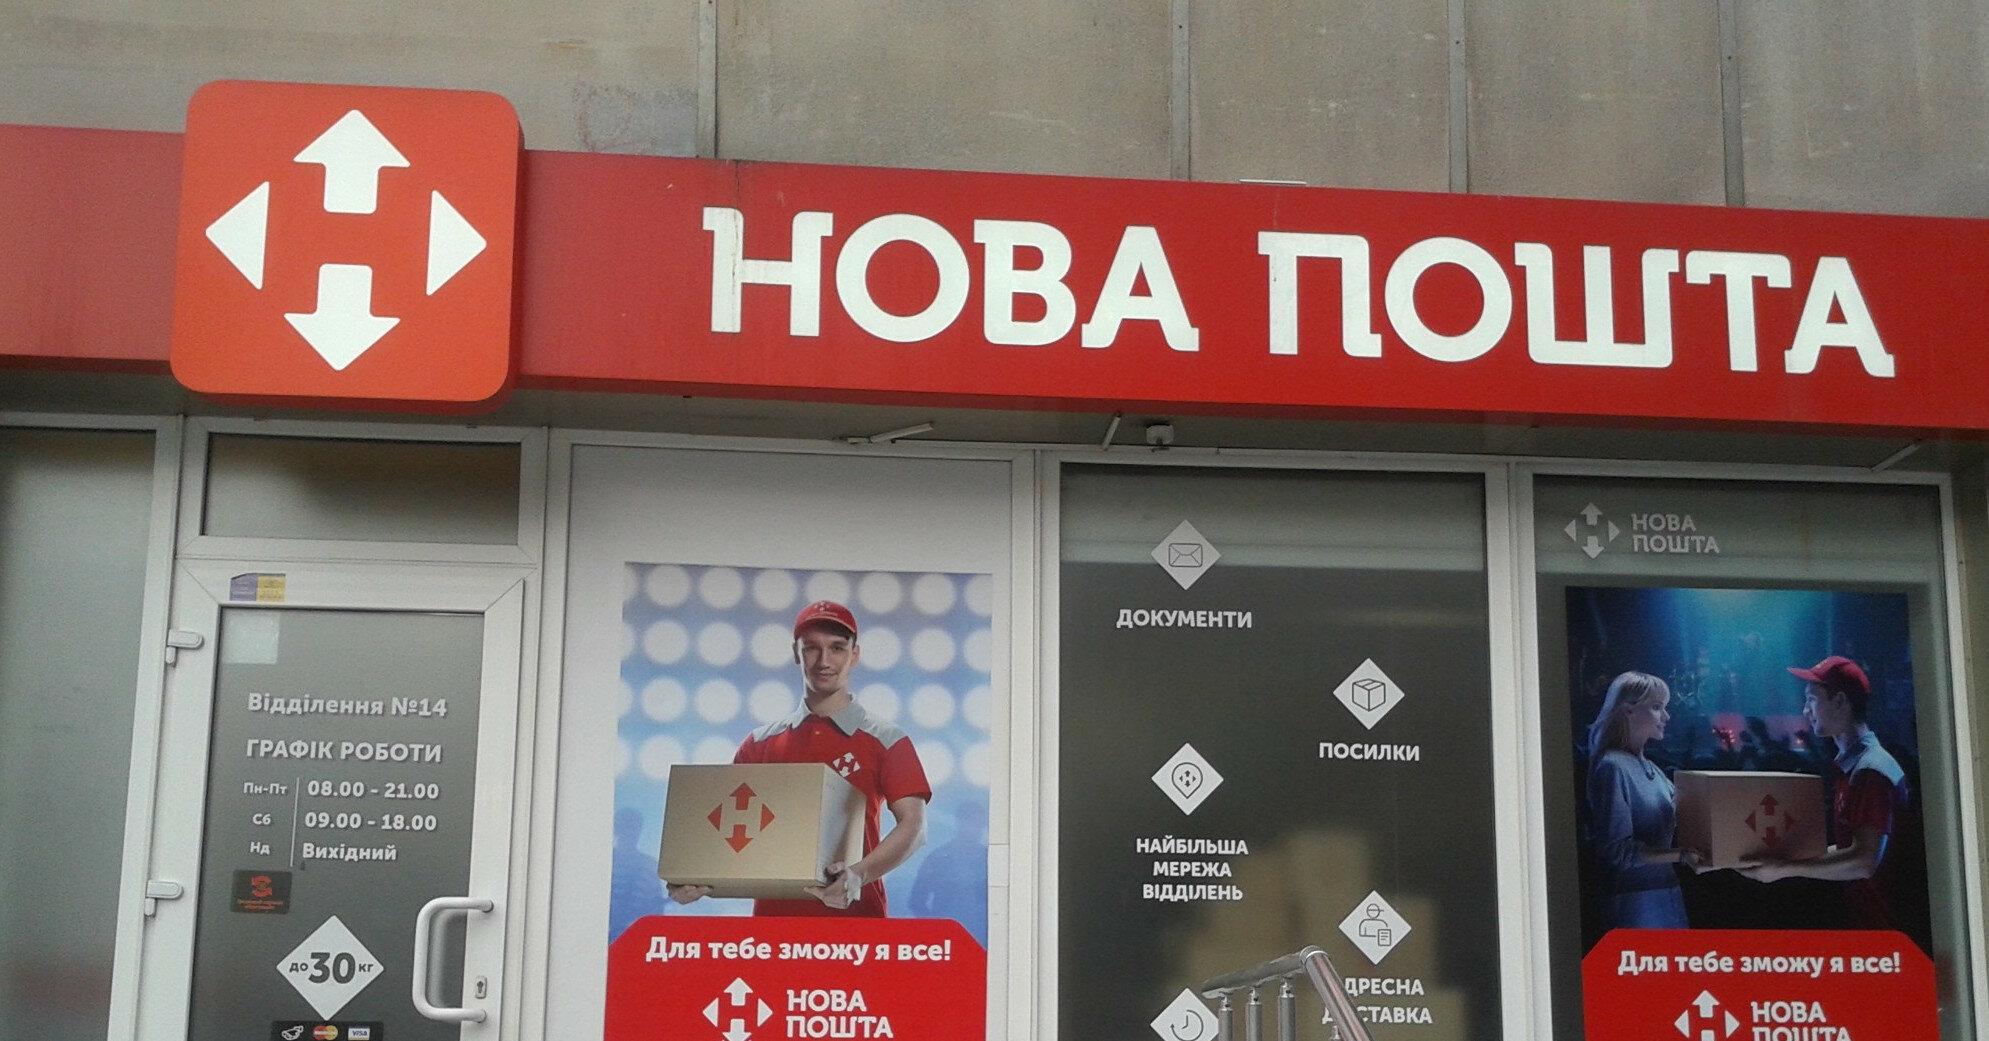 Нова пошта подала в суд на Госпродпотребслужбу